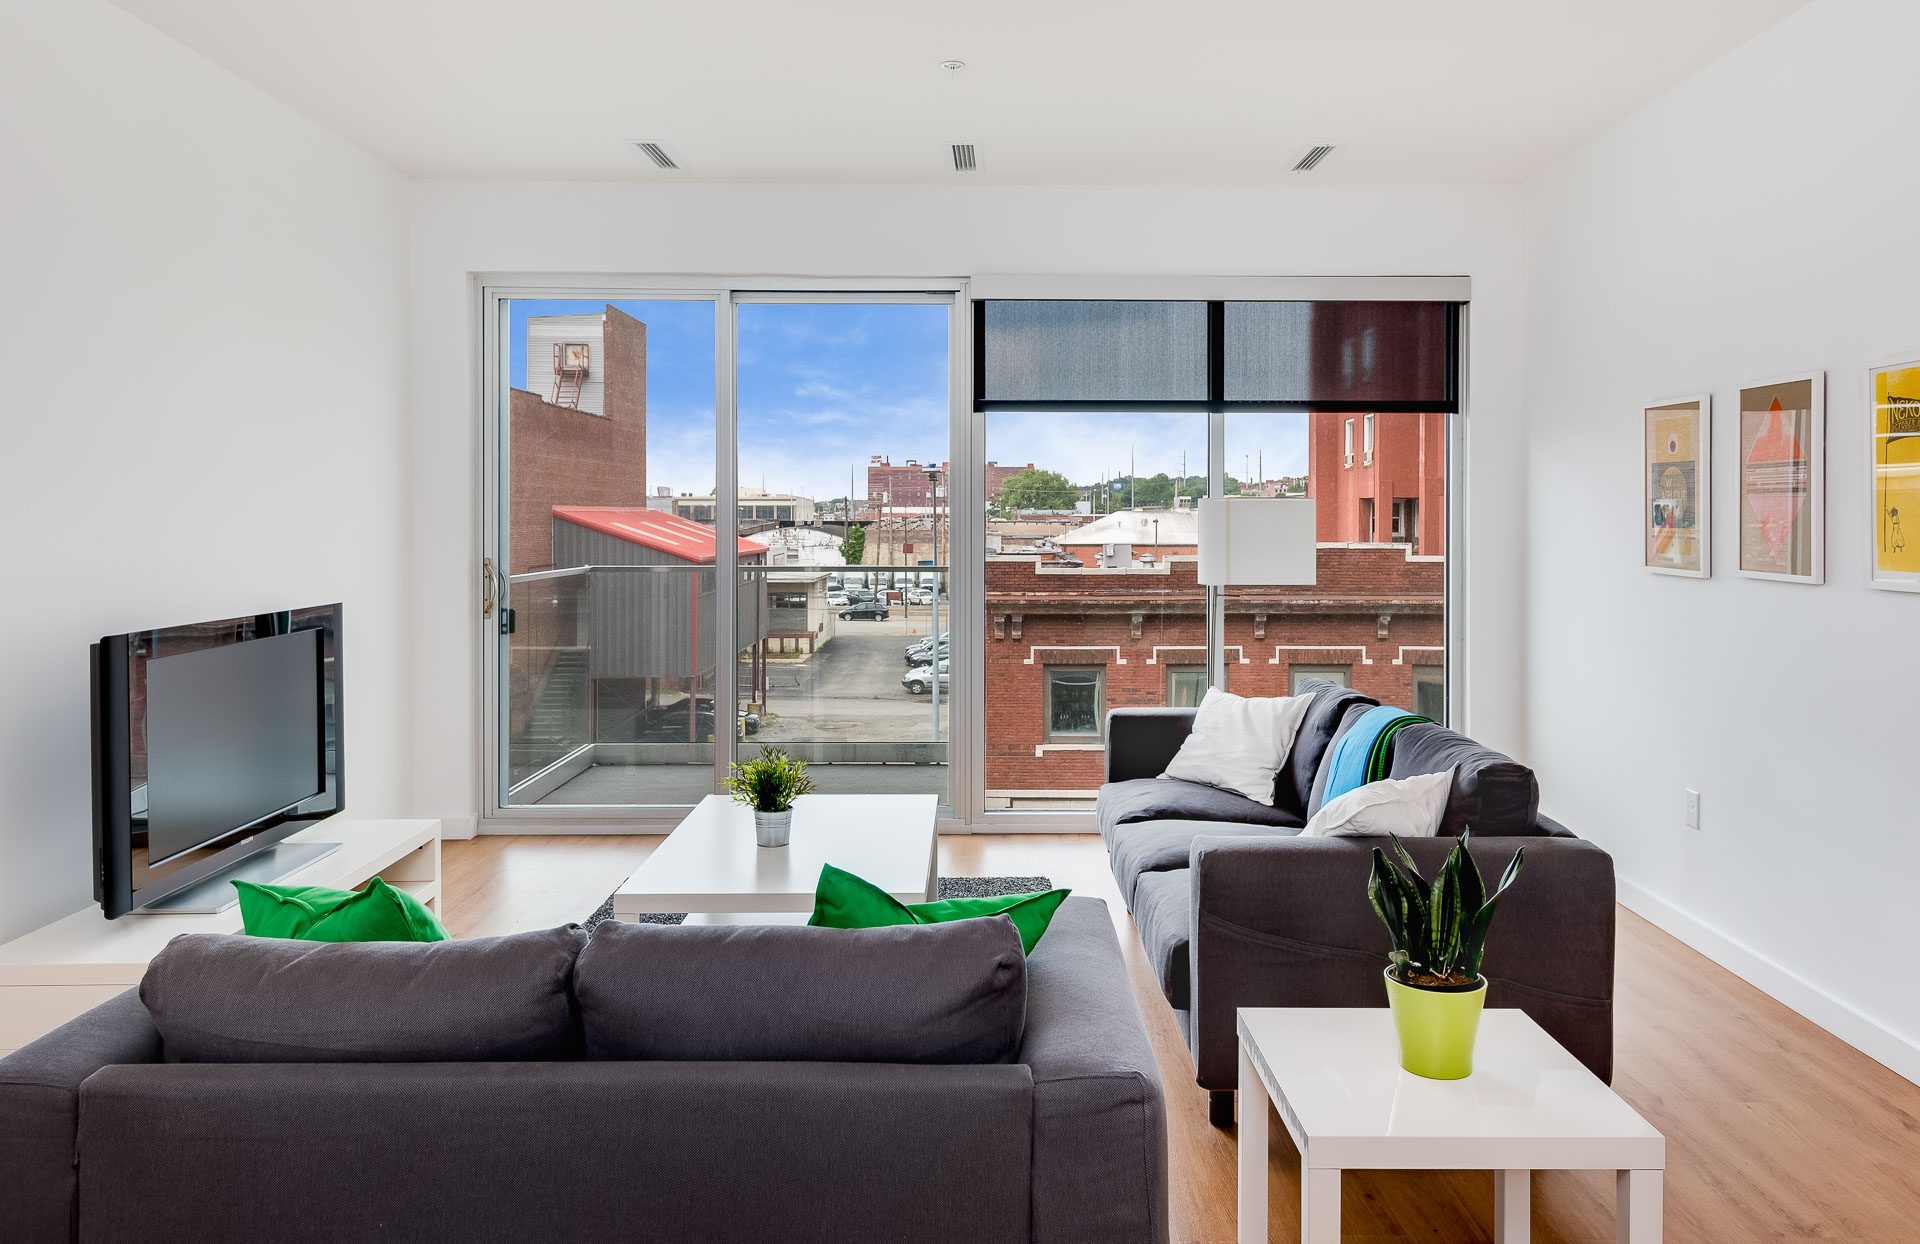 Sherpa Media Kansas City - Apartments & Multi-Family Housing - 13